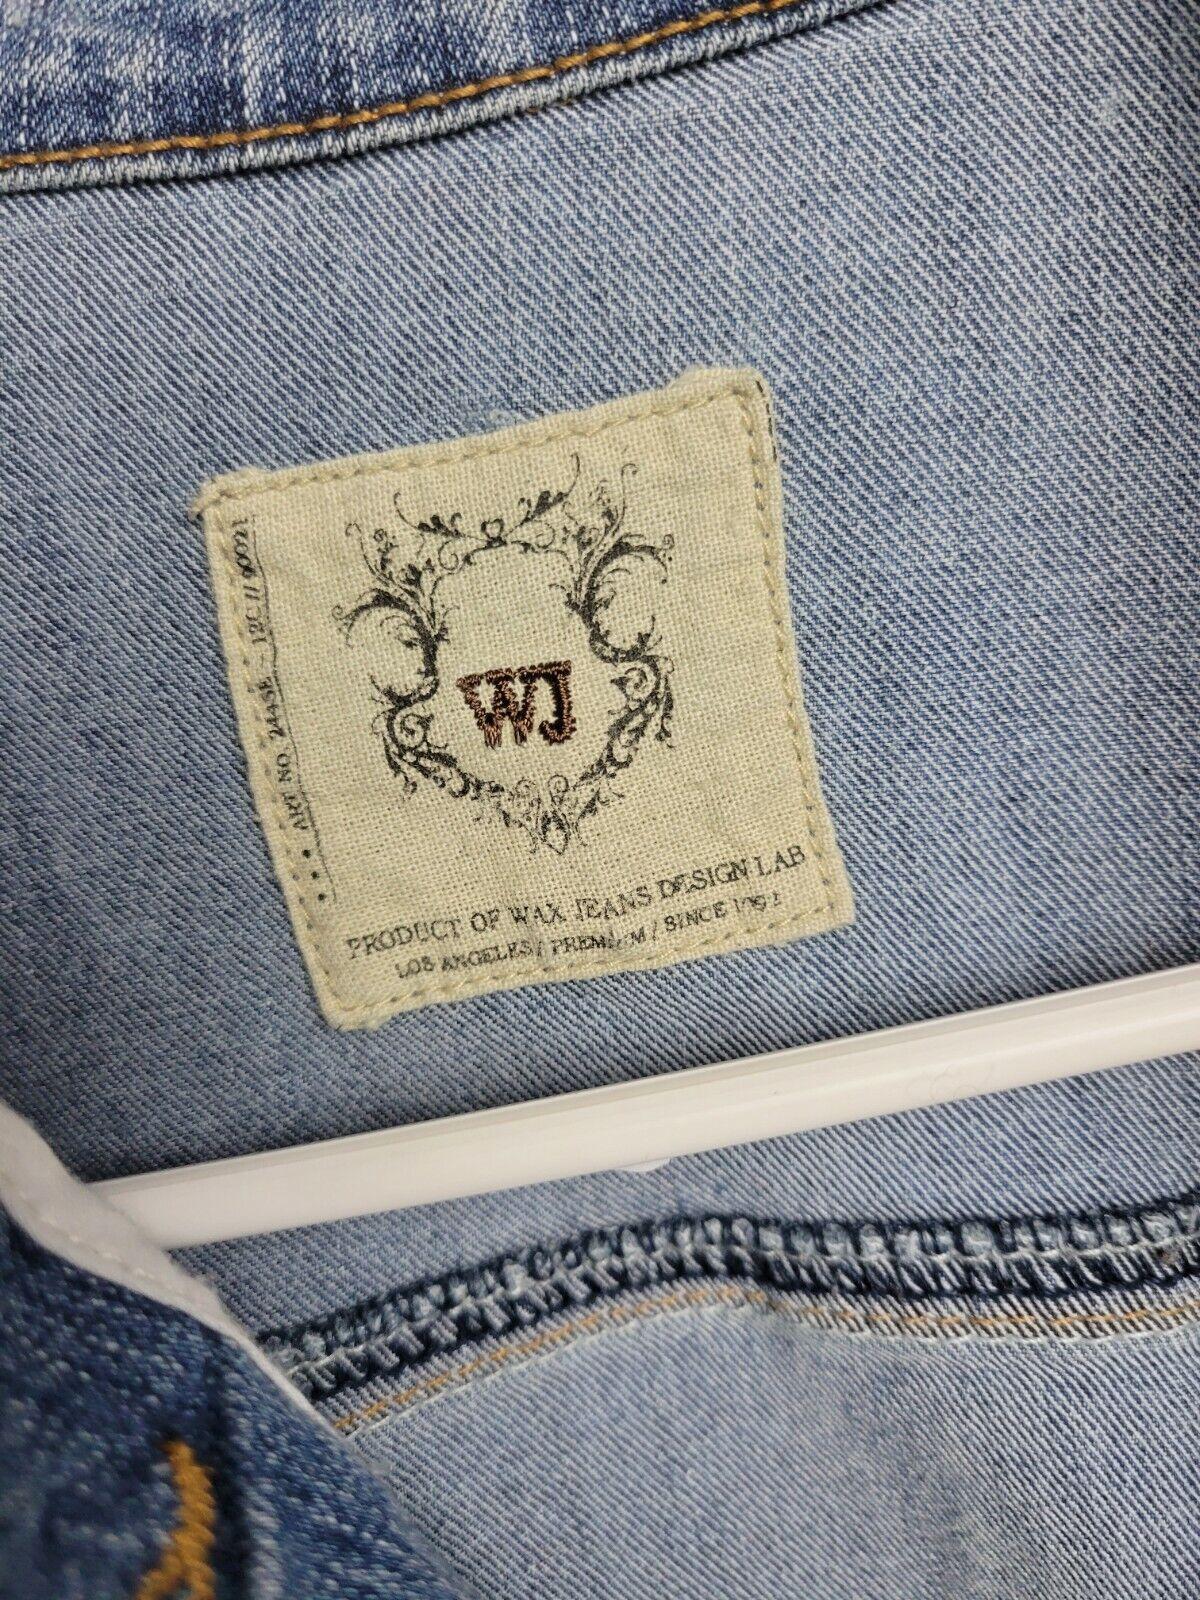 Womens Jean Jacket Small Wax Jeans - image 2